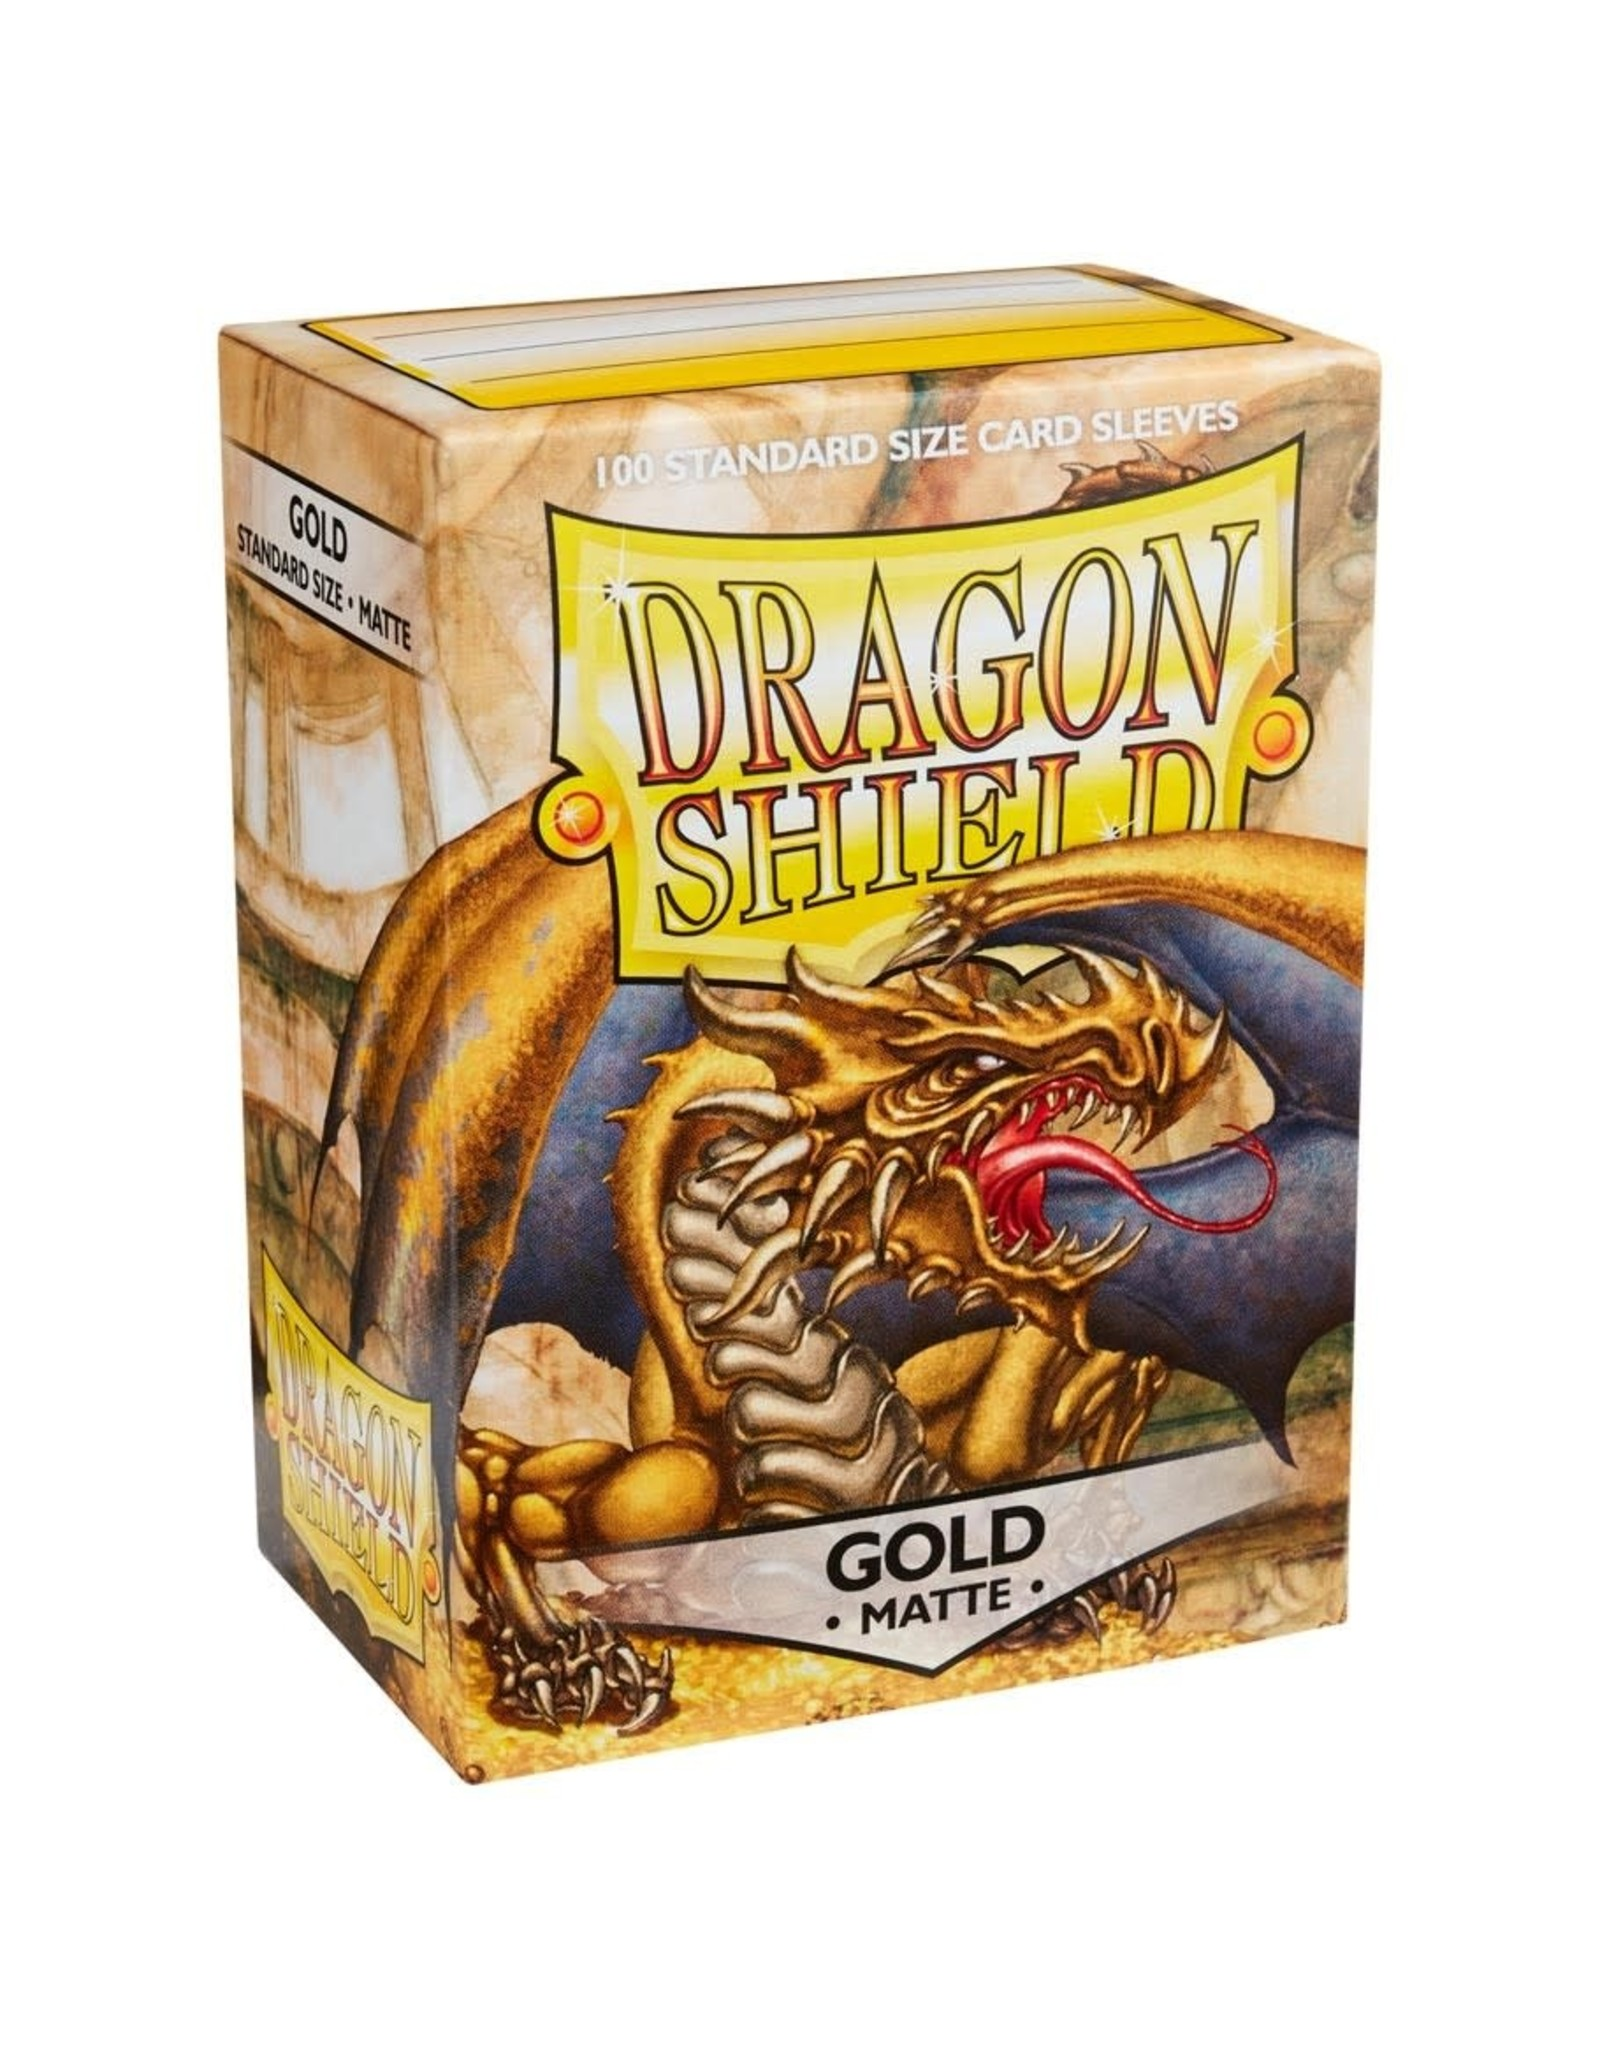 Dragon Shield Dragon Shield Matte Gold Card Sleeves (100)